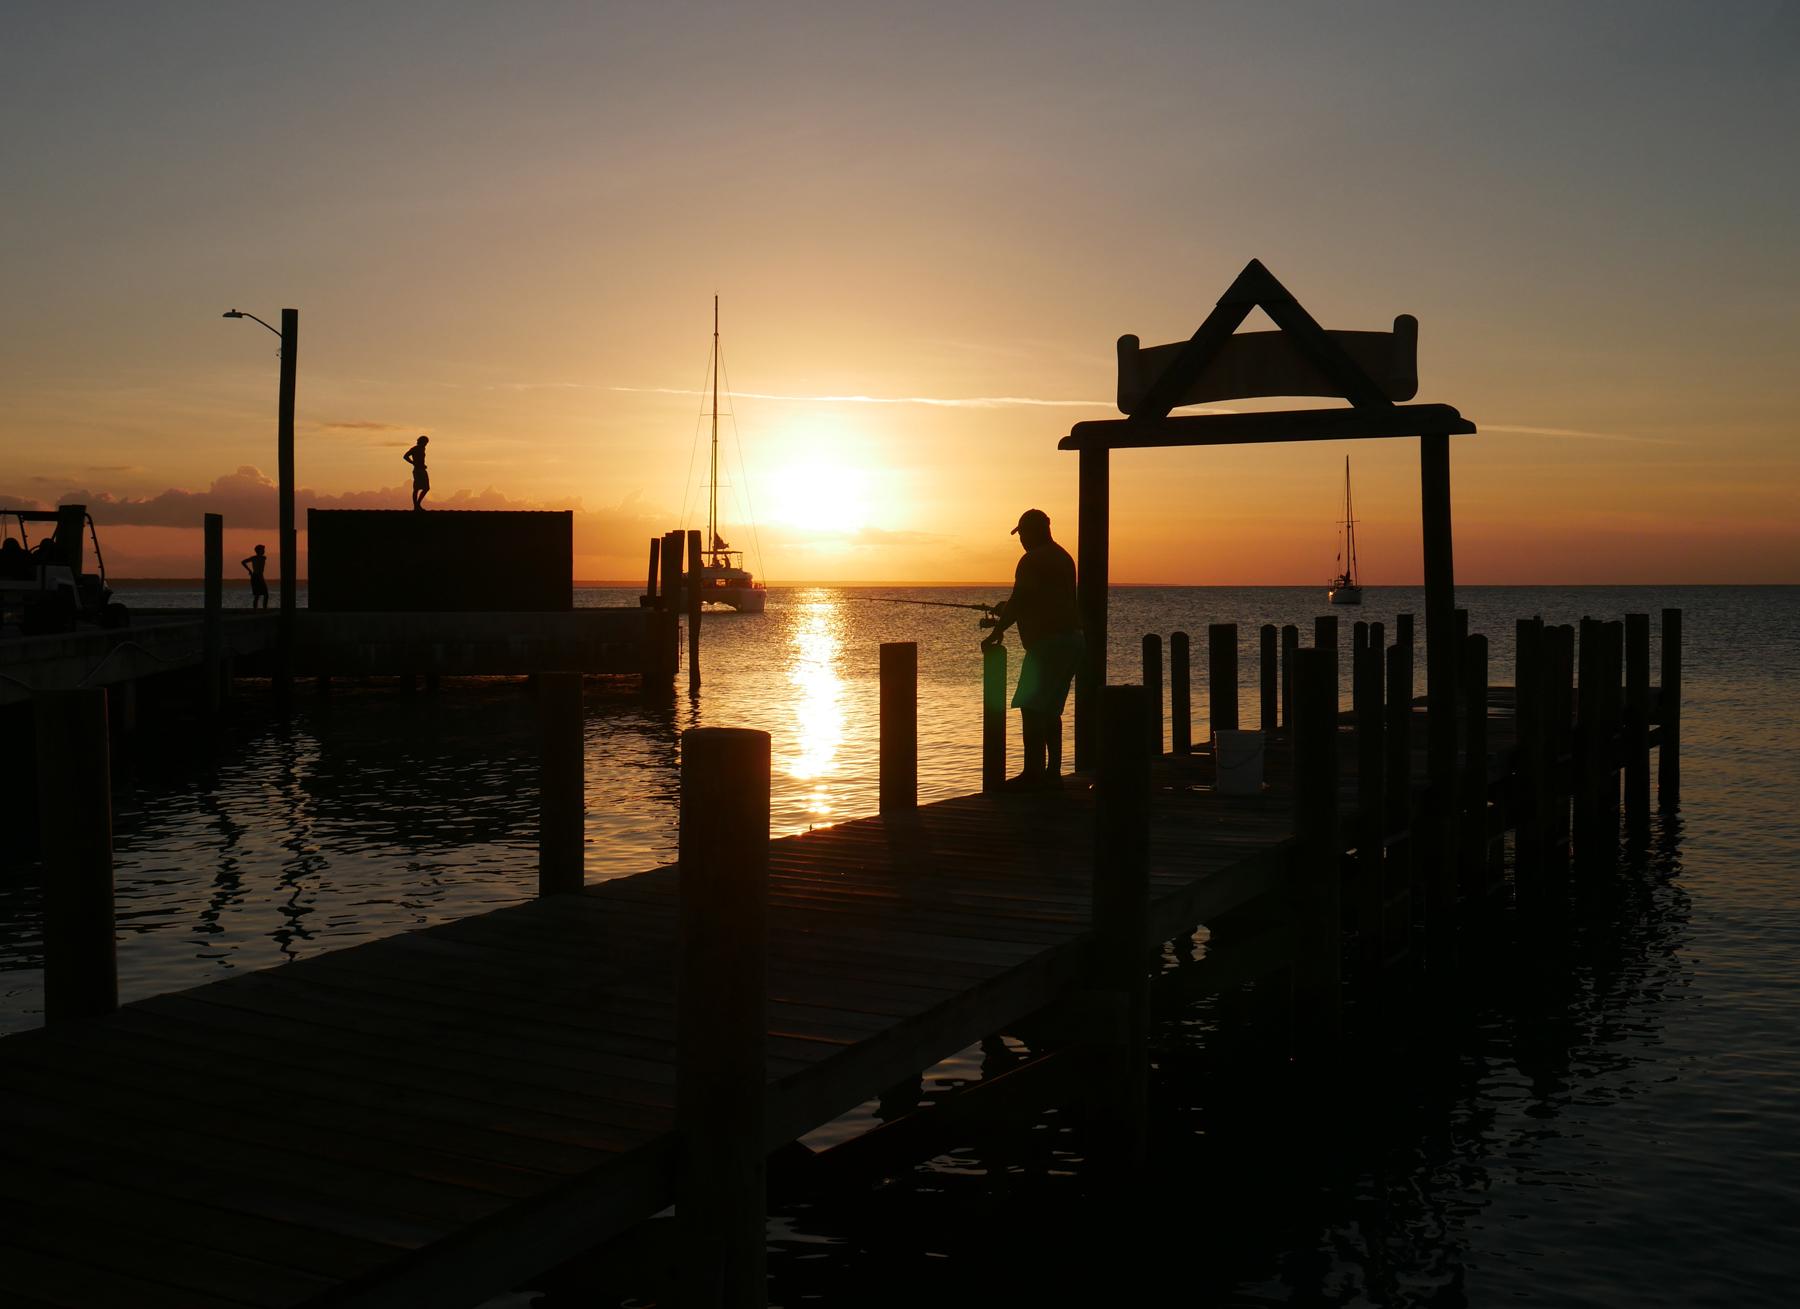 Summer sunset - Green Turtle Cay, Abaco, Bahamas